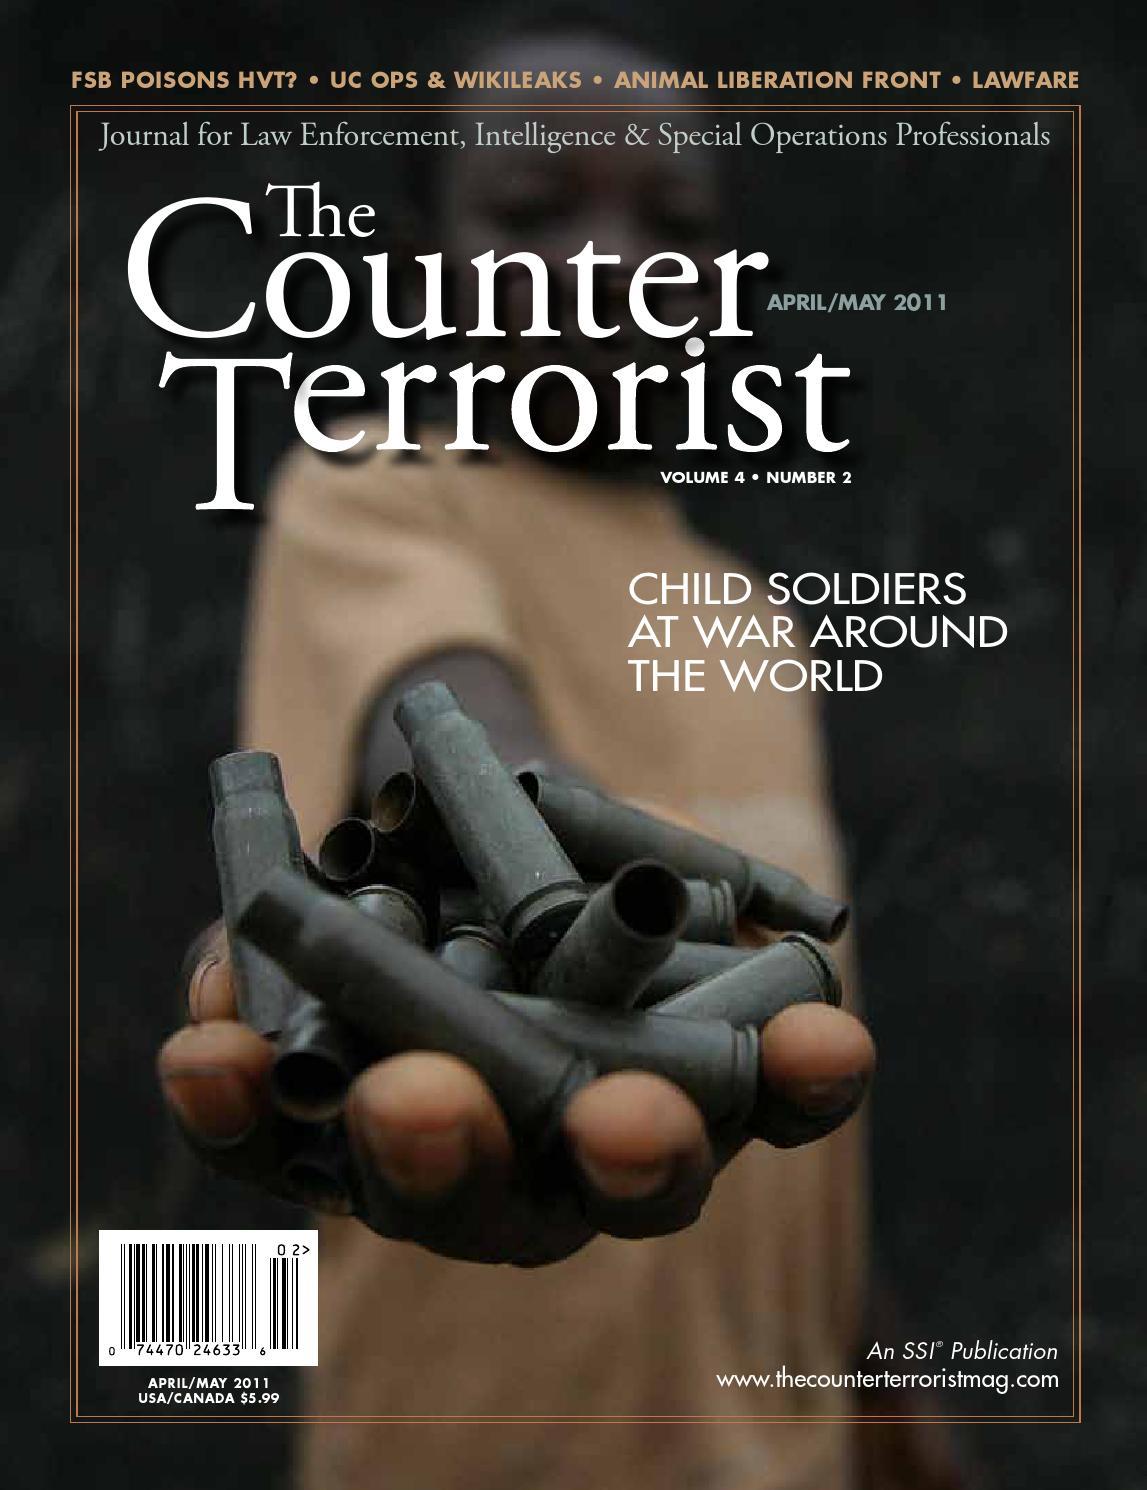 Alpha Krav Maga Manchester Ct the counter terrorist magazine - april/may 2011solomon